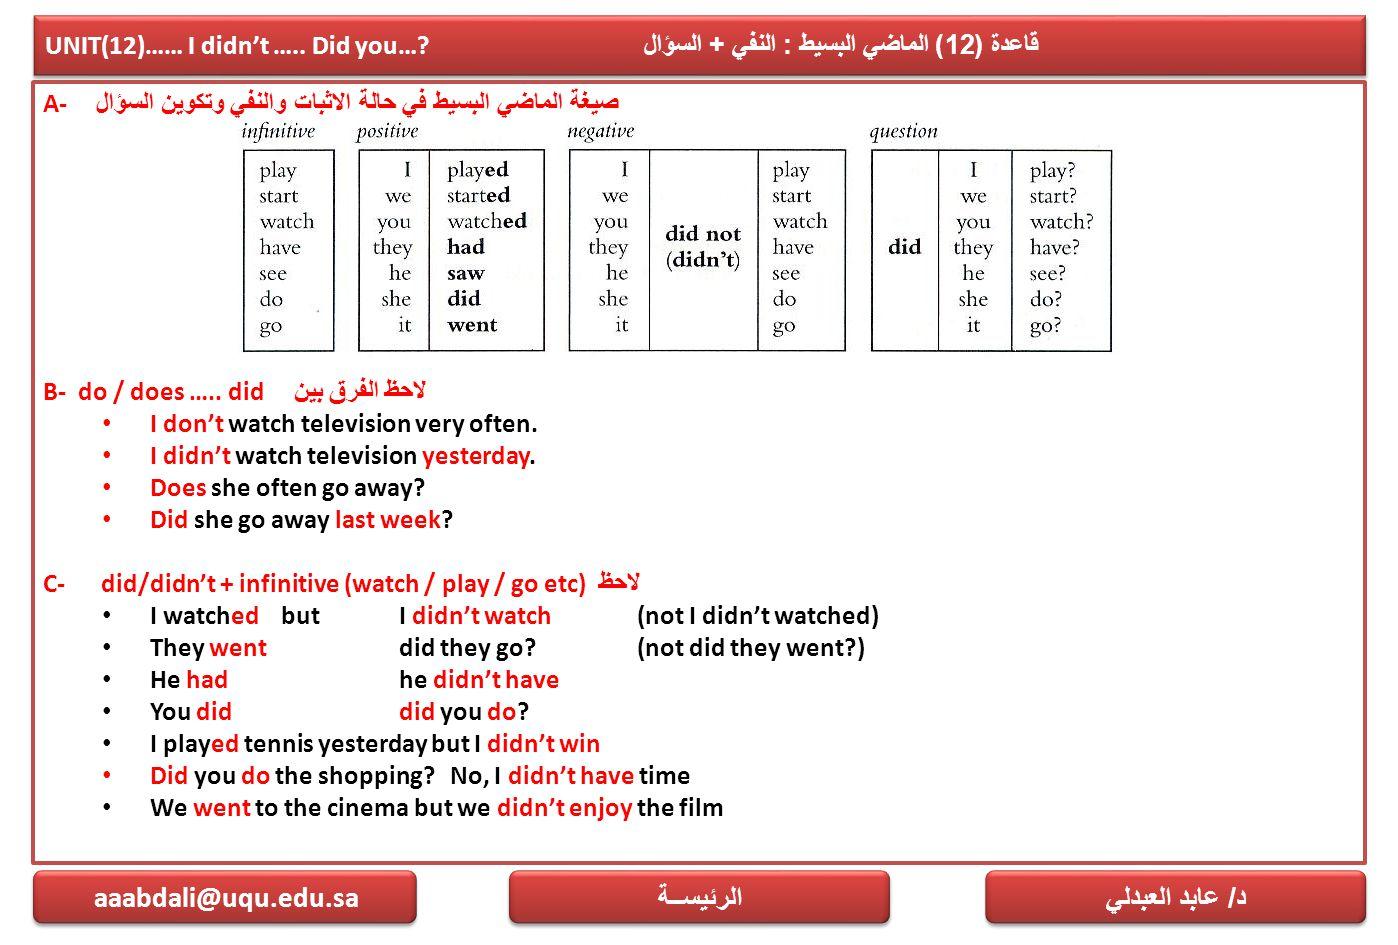 UNIT(12)…… I didn't ….. Did you…? قاعدة (12) الماضي البسيط : النفي + السؤال A- صيغة الماضي البسيط في حالة الاثبات والنفي وتكوين السؤال B- do / does ….